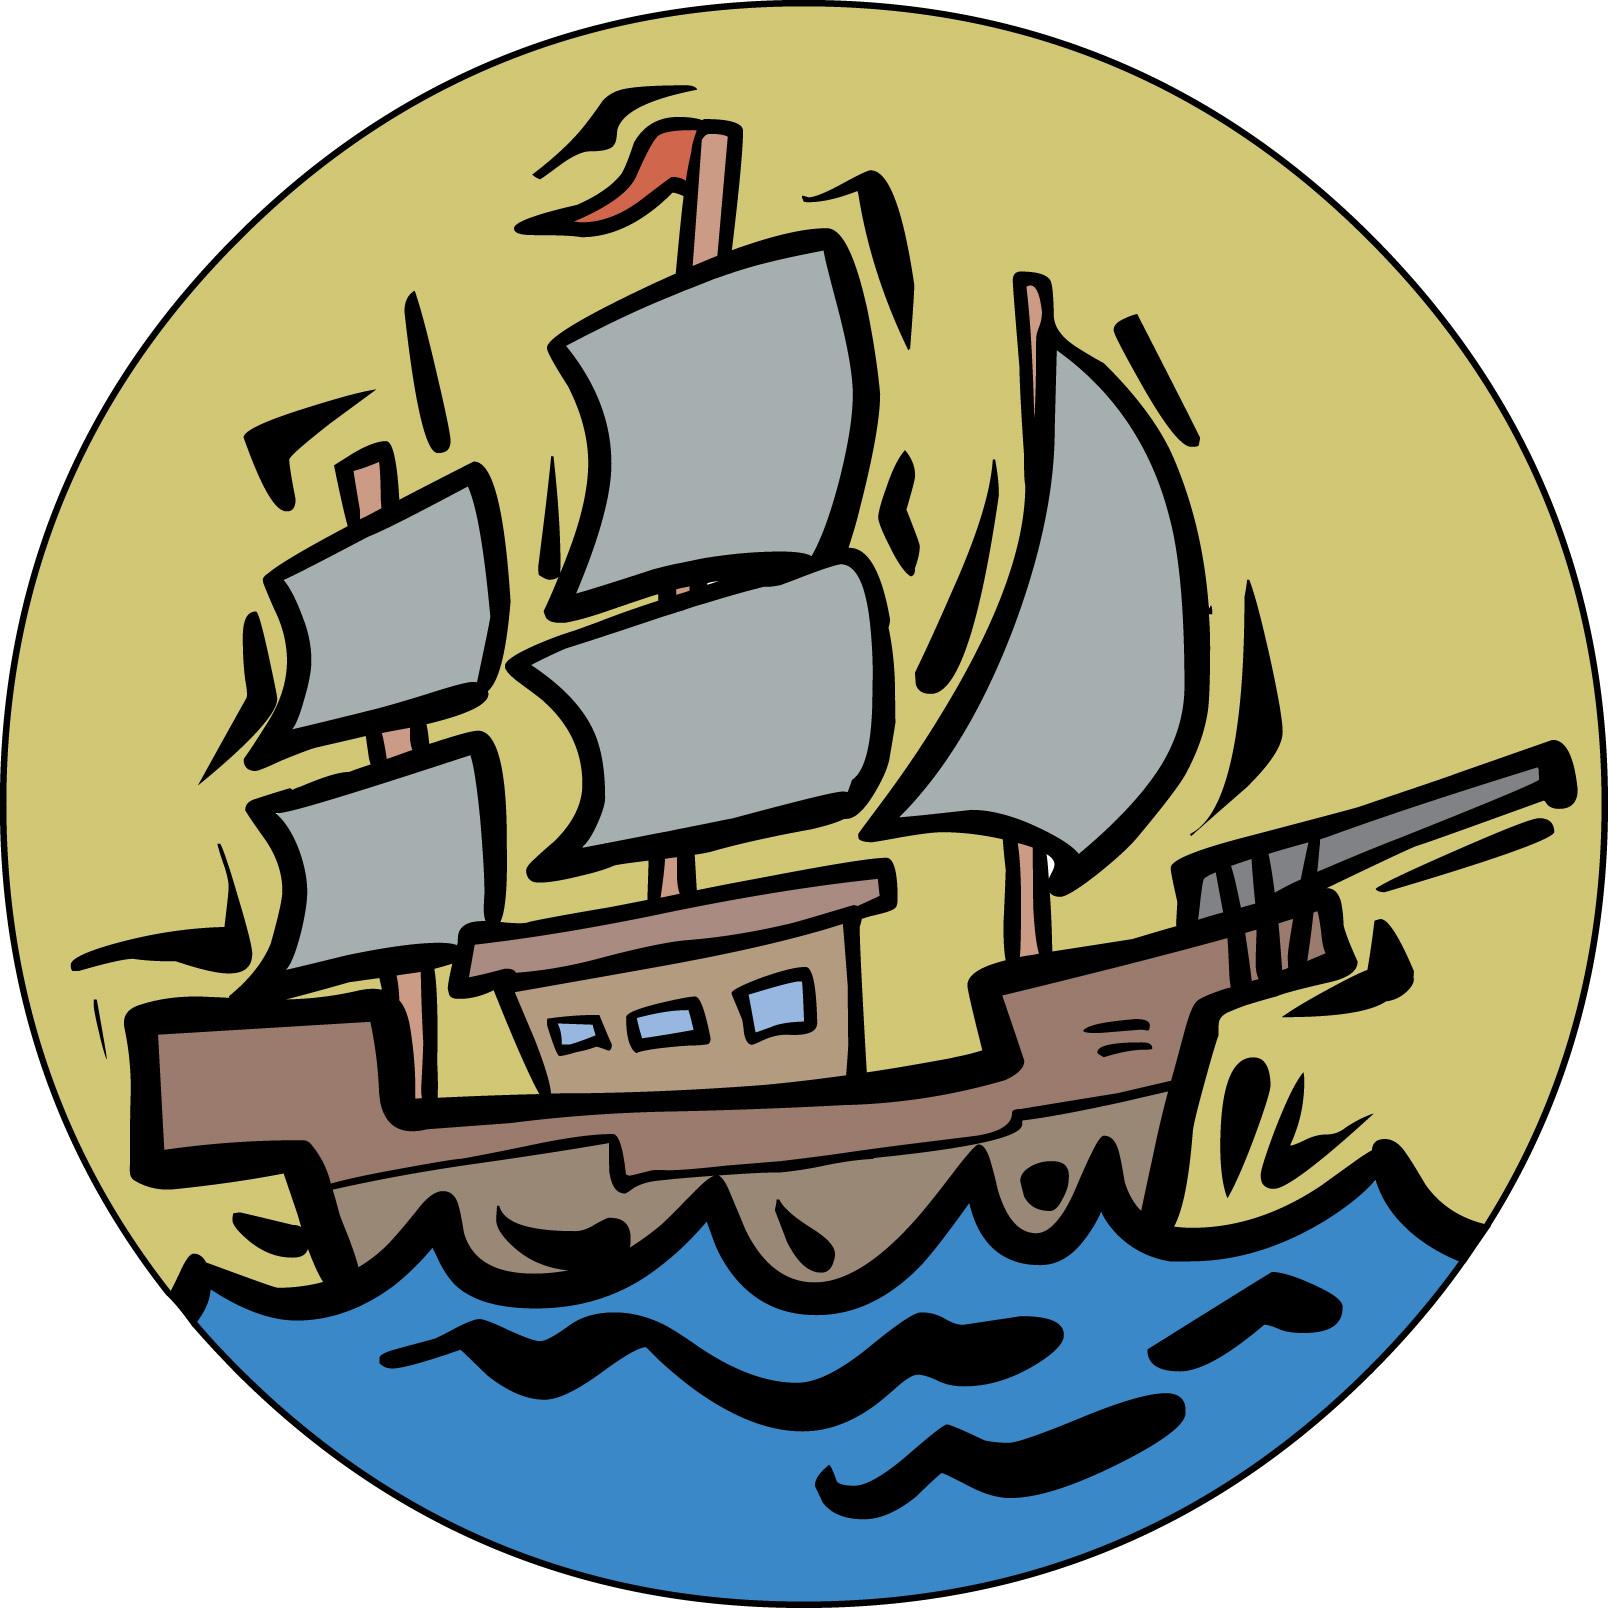 treasure island essay reportz17 web fc2 com treasure island essays gradesaver